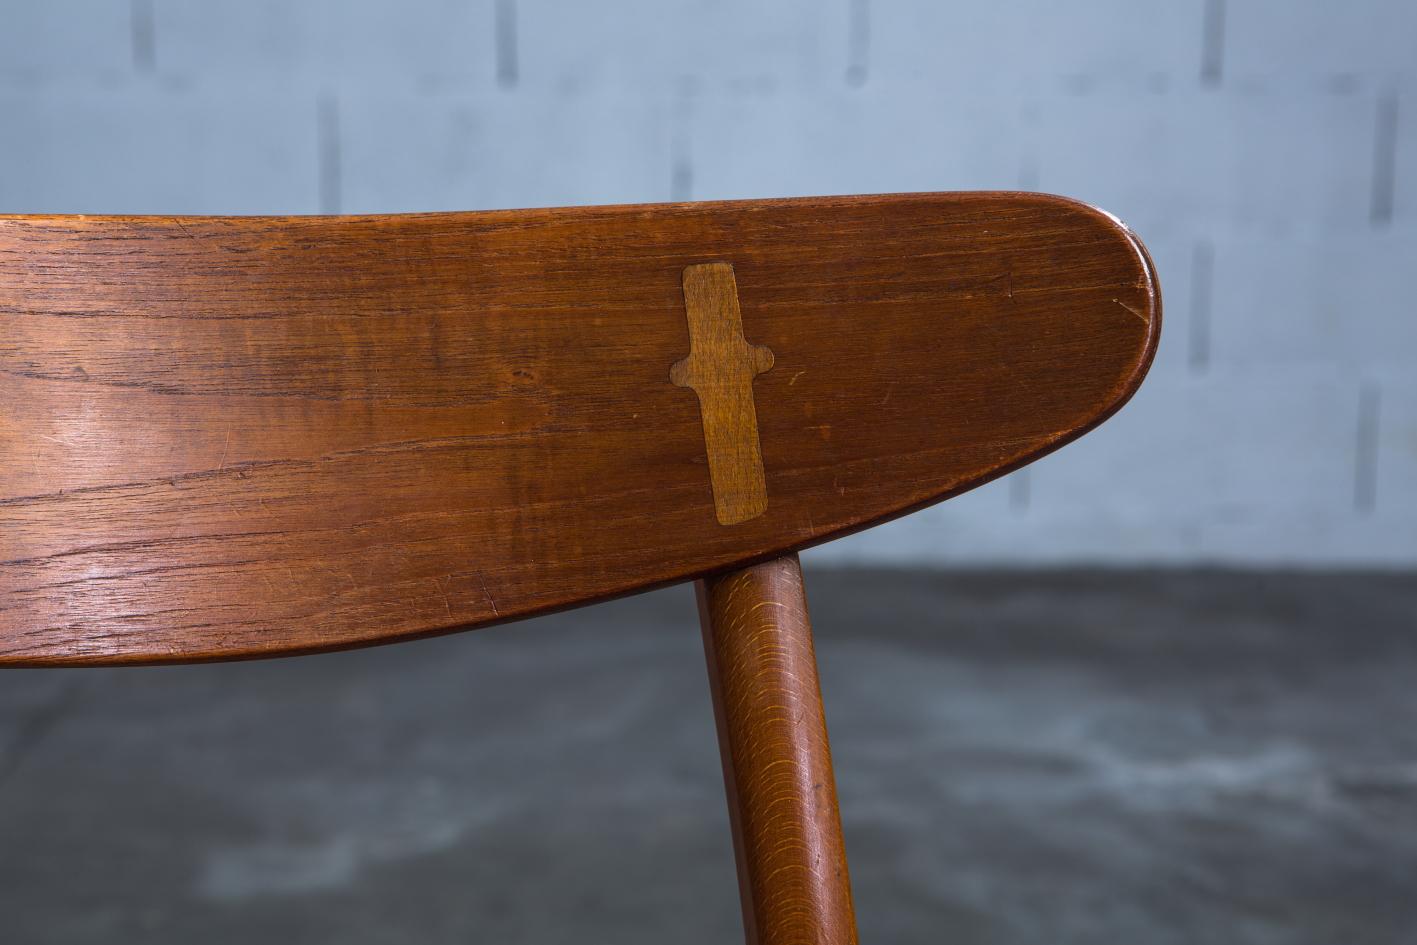 CH 30 chairs - Hans J. Wegner for Carl Hansen - Wood joint detail